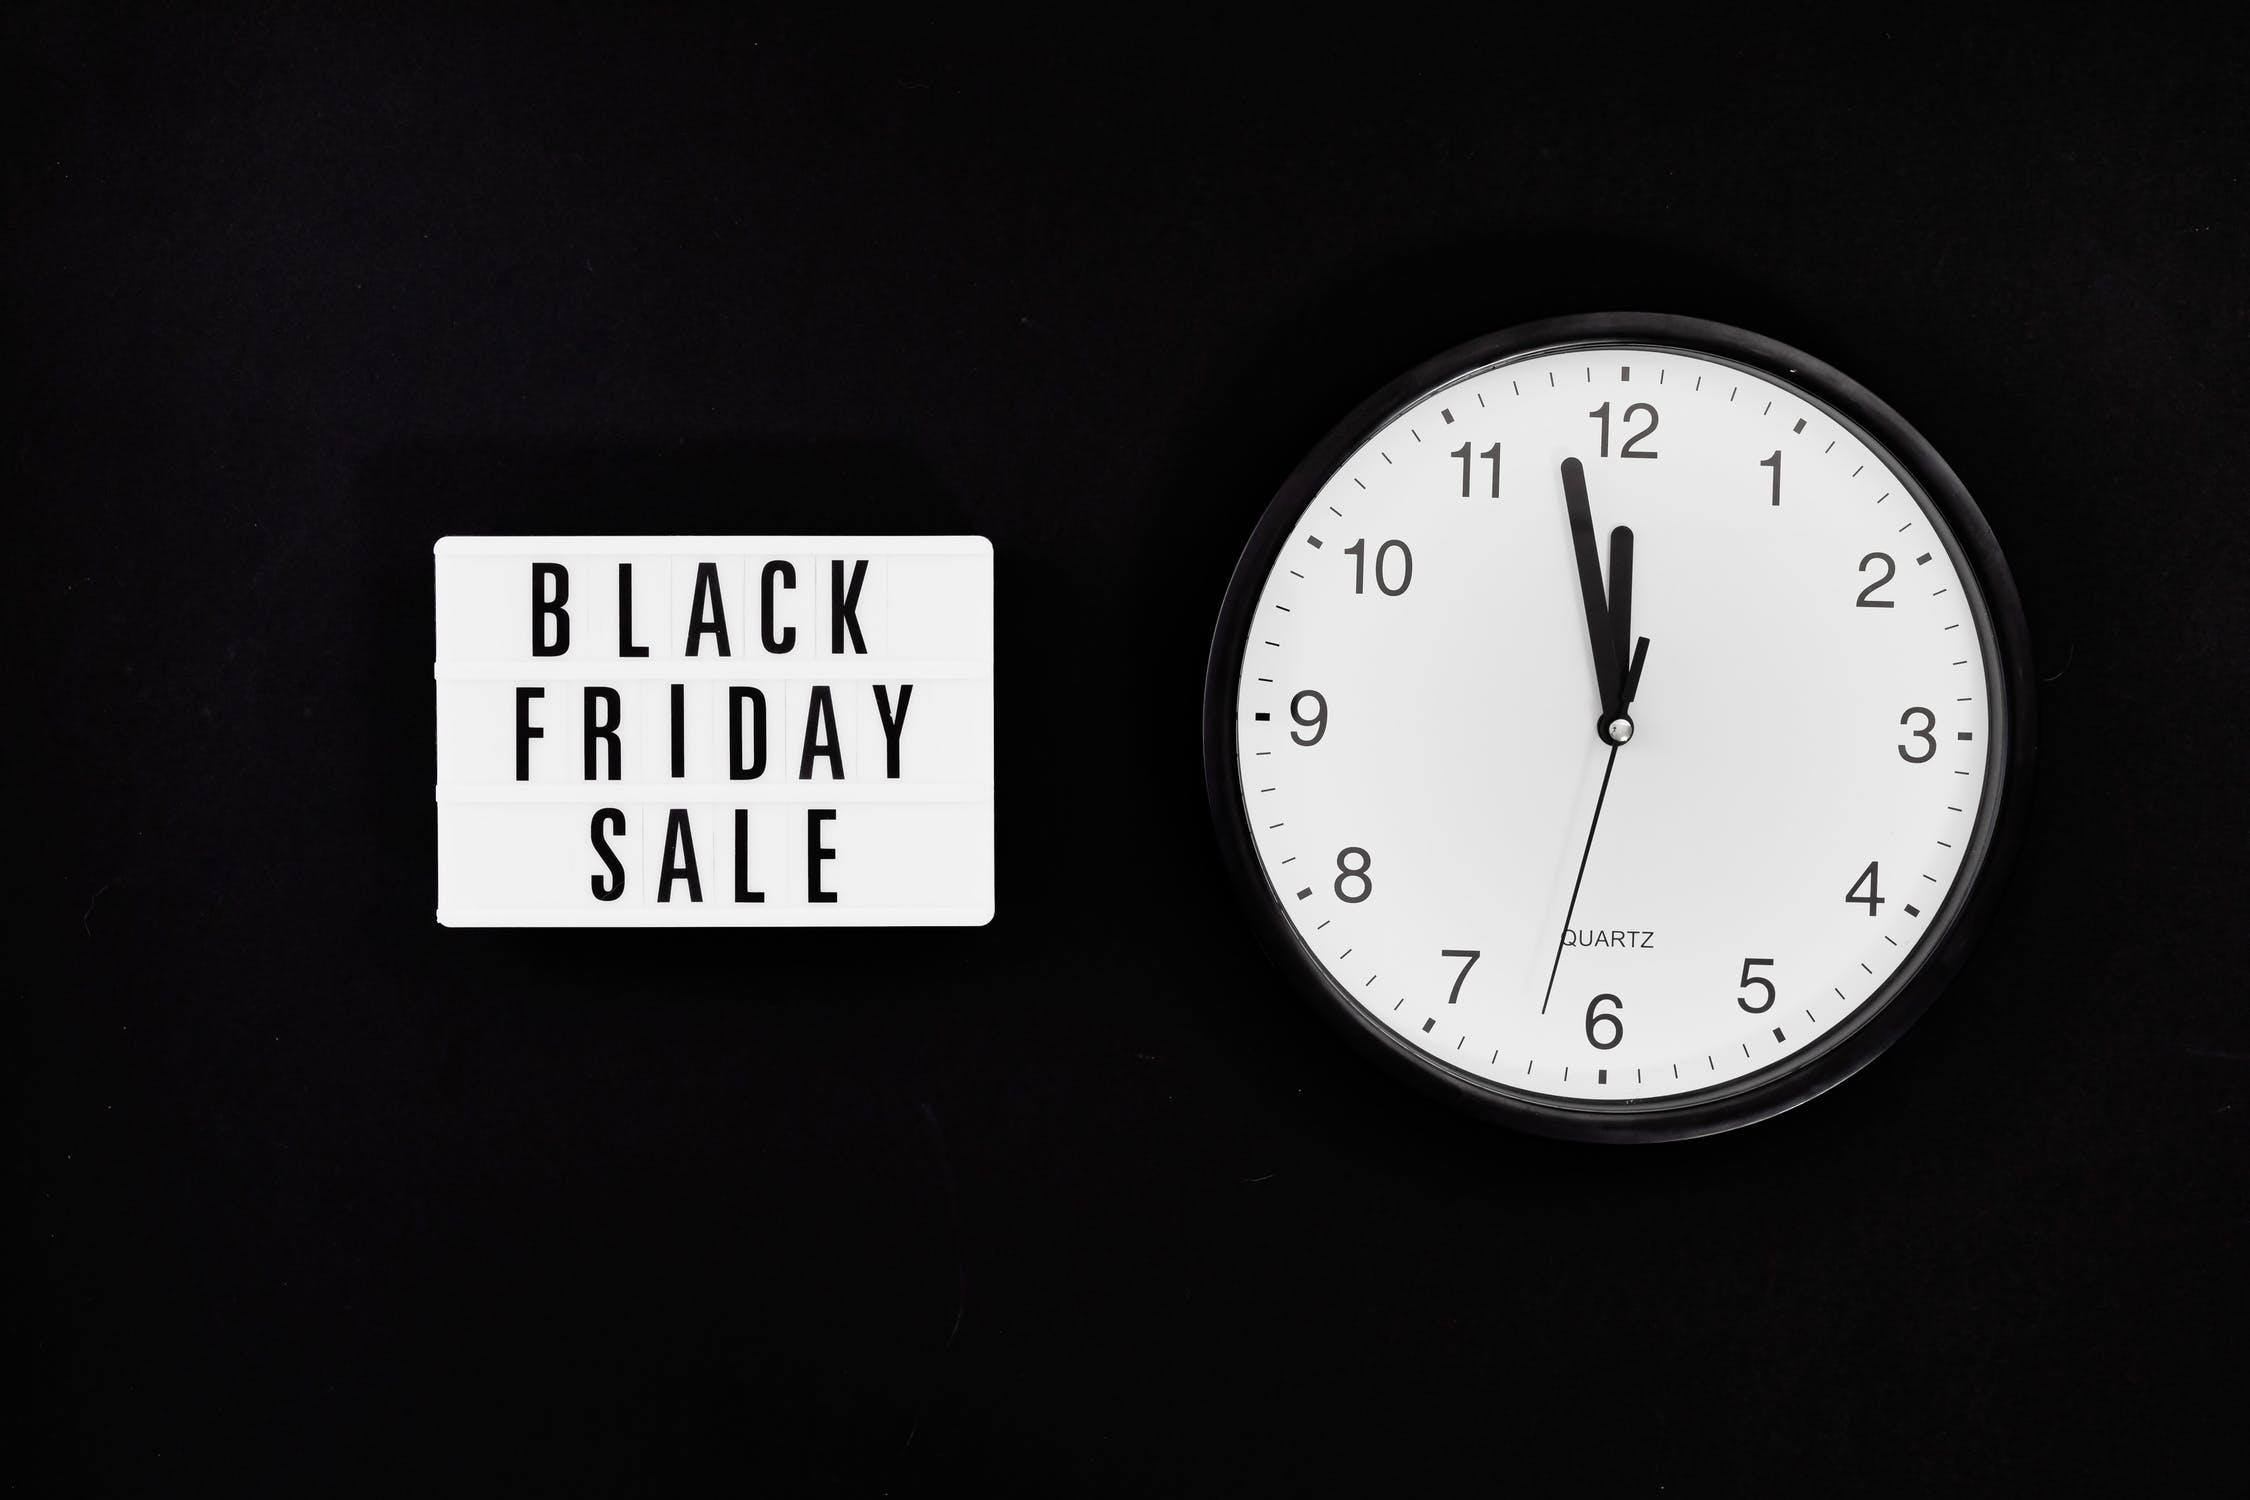 yescomusa, black friday sale 2020